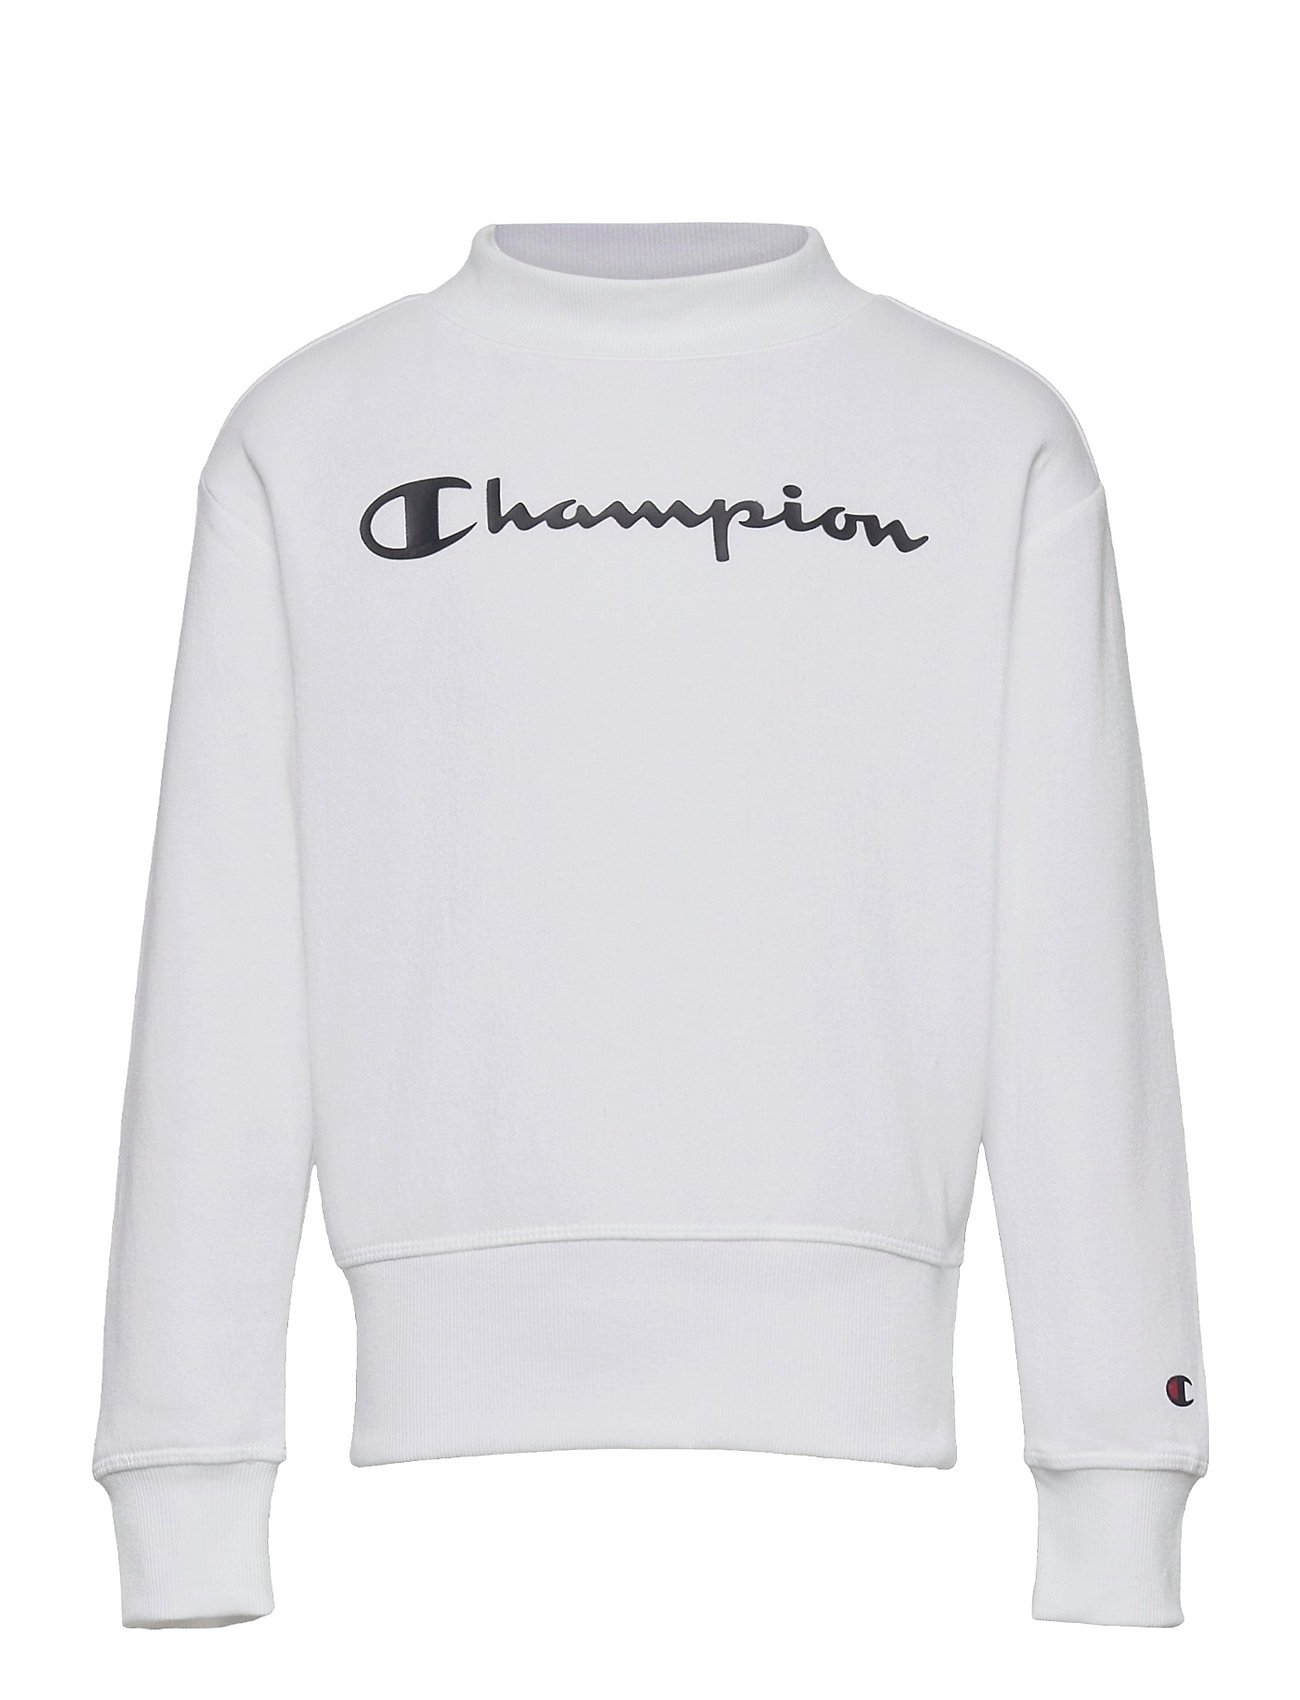 Crewneck Sweatshirt Sweatshirt Trøje Hvid Champion